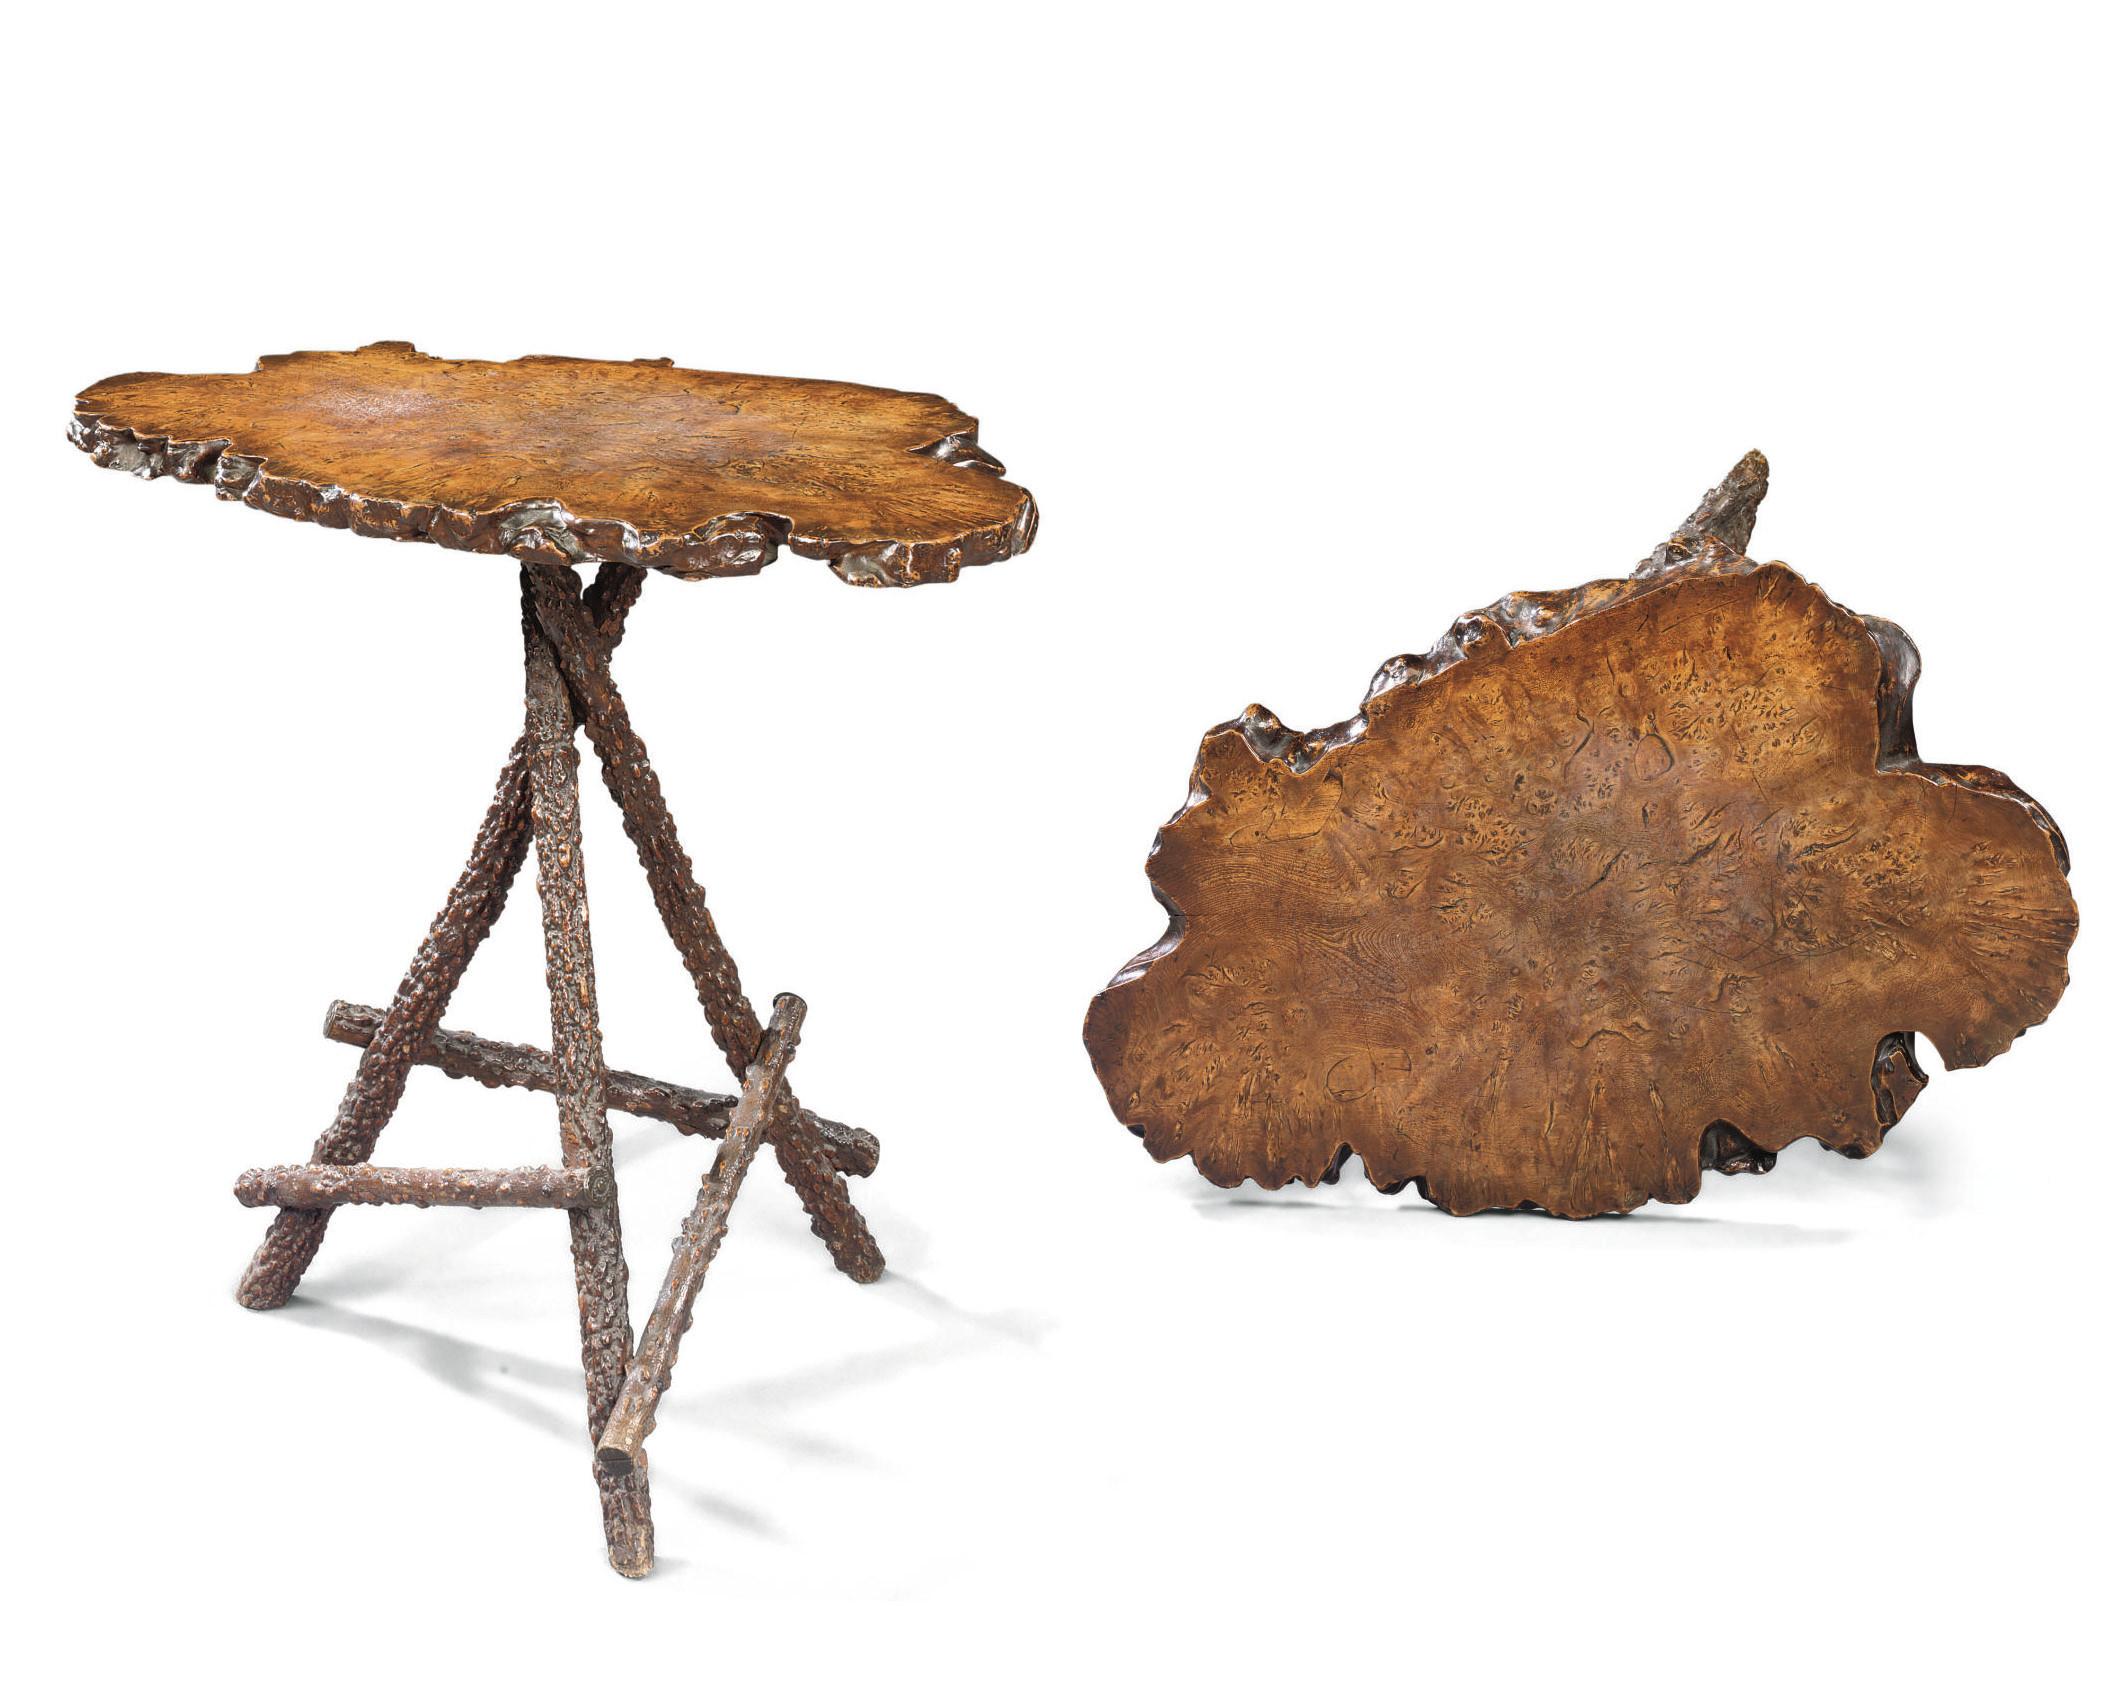 A 'RUSTIC' BURR-ELM TABLE